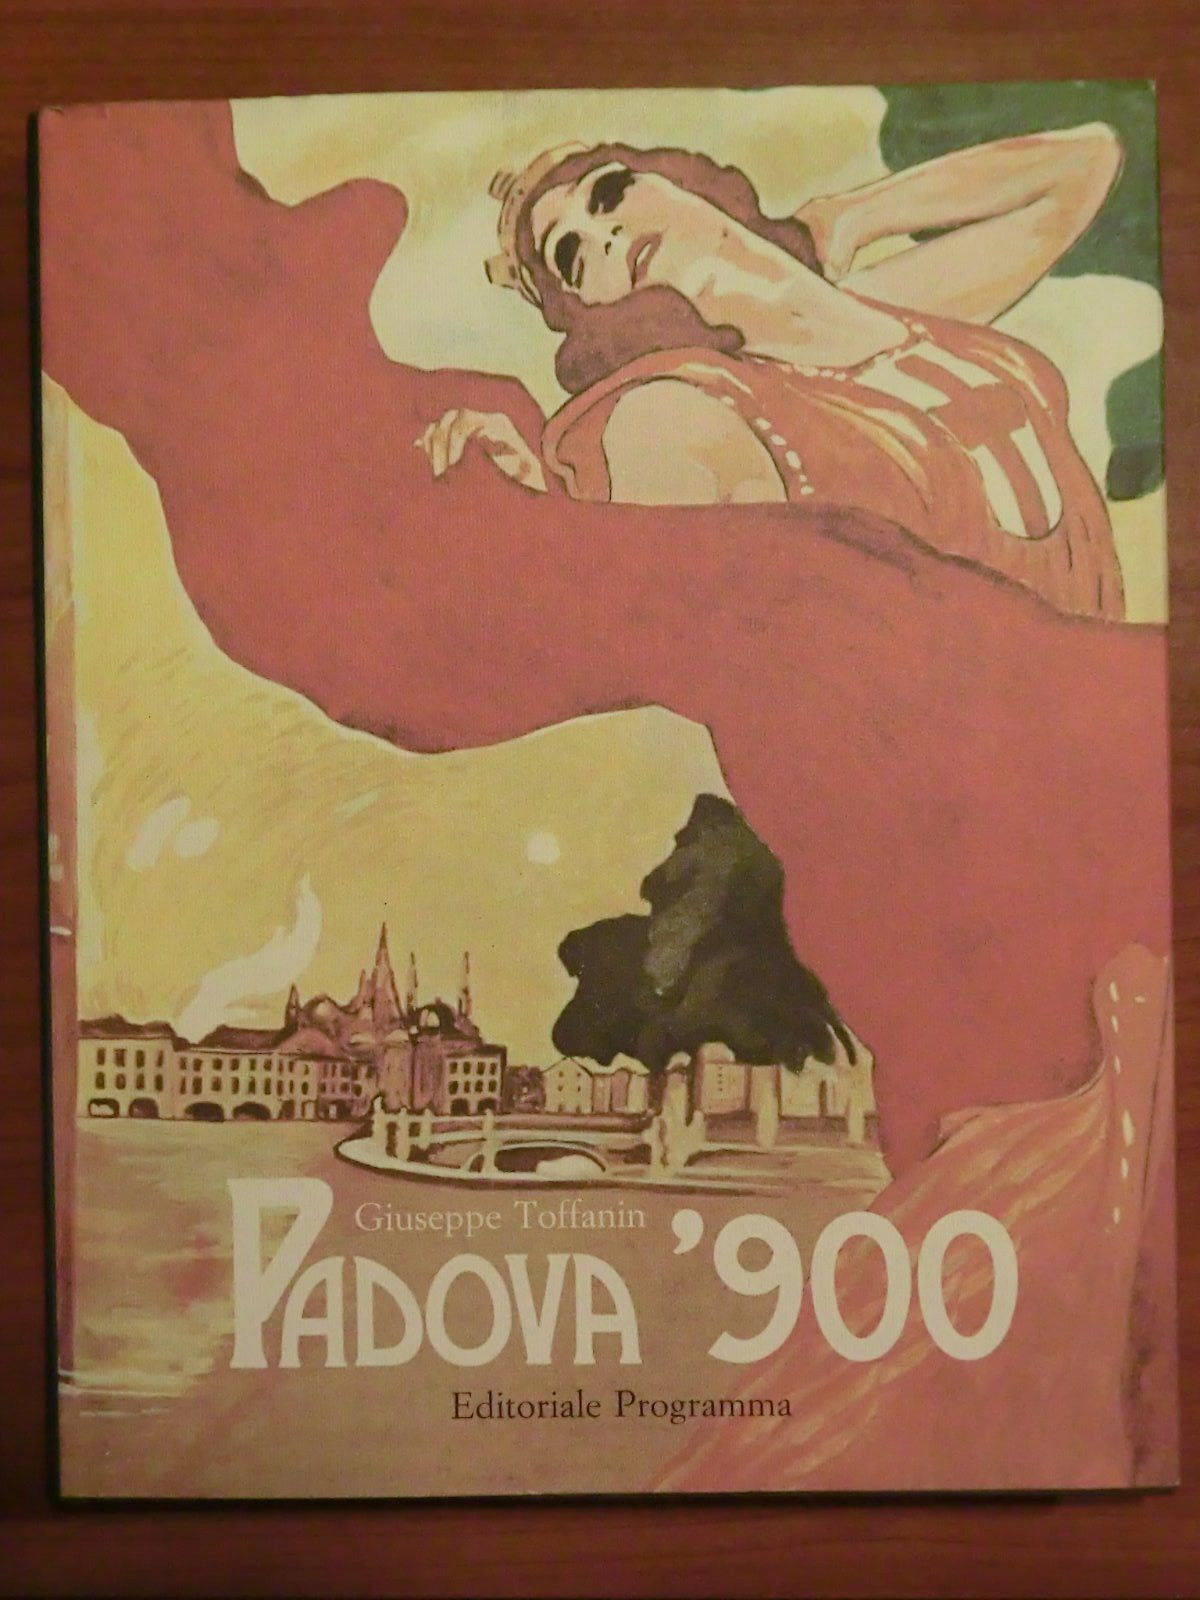 Padova '900